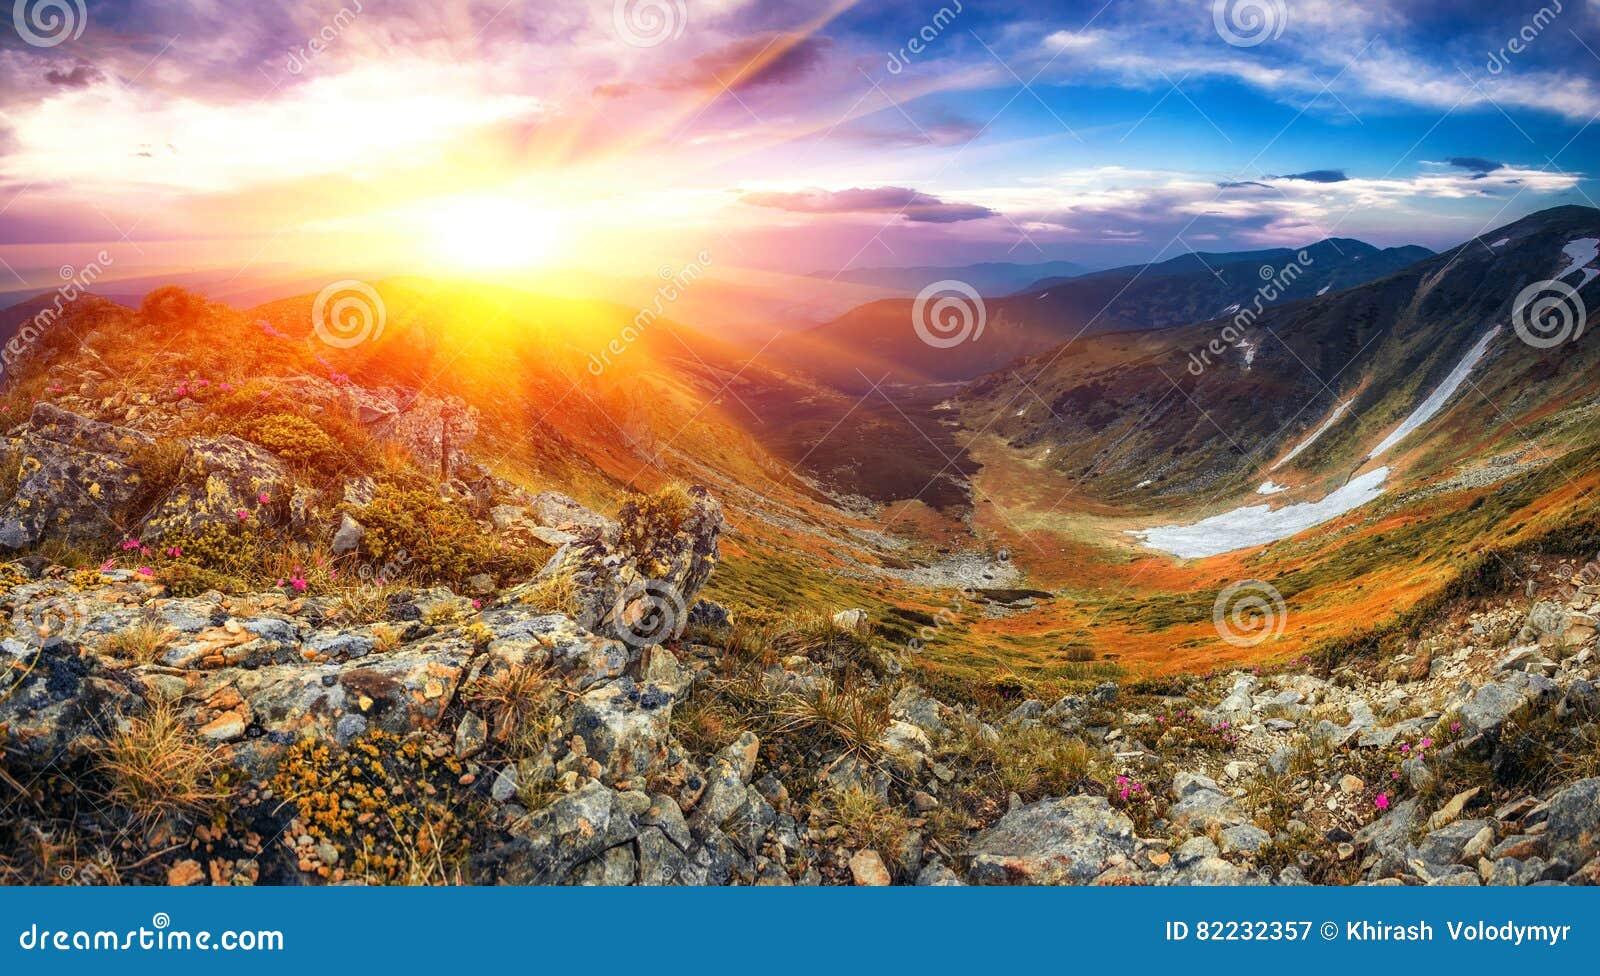 beaute-paysaged-voyage